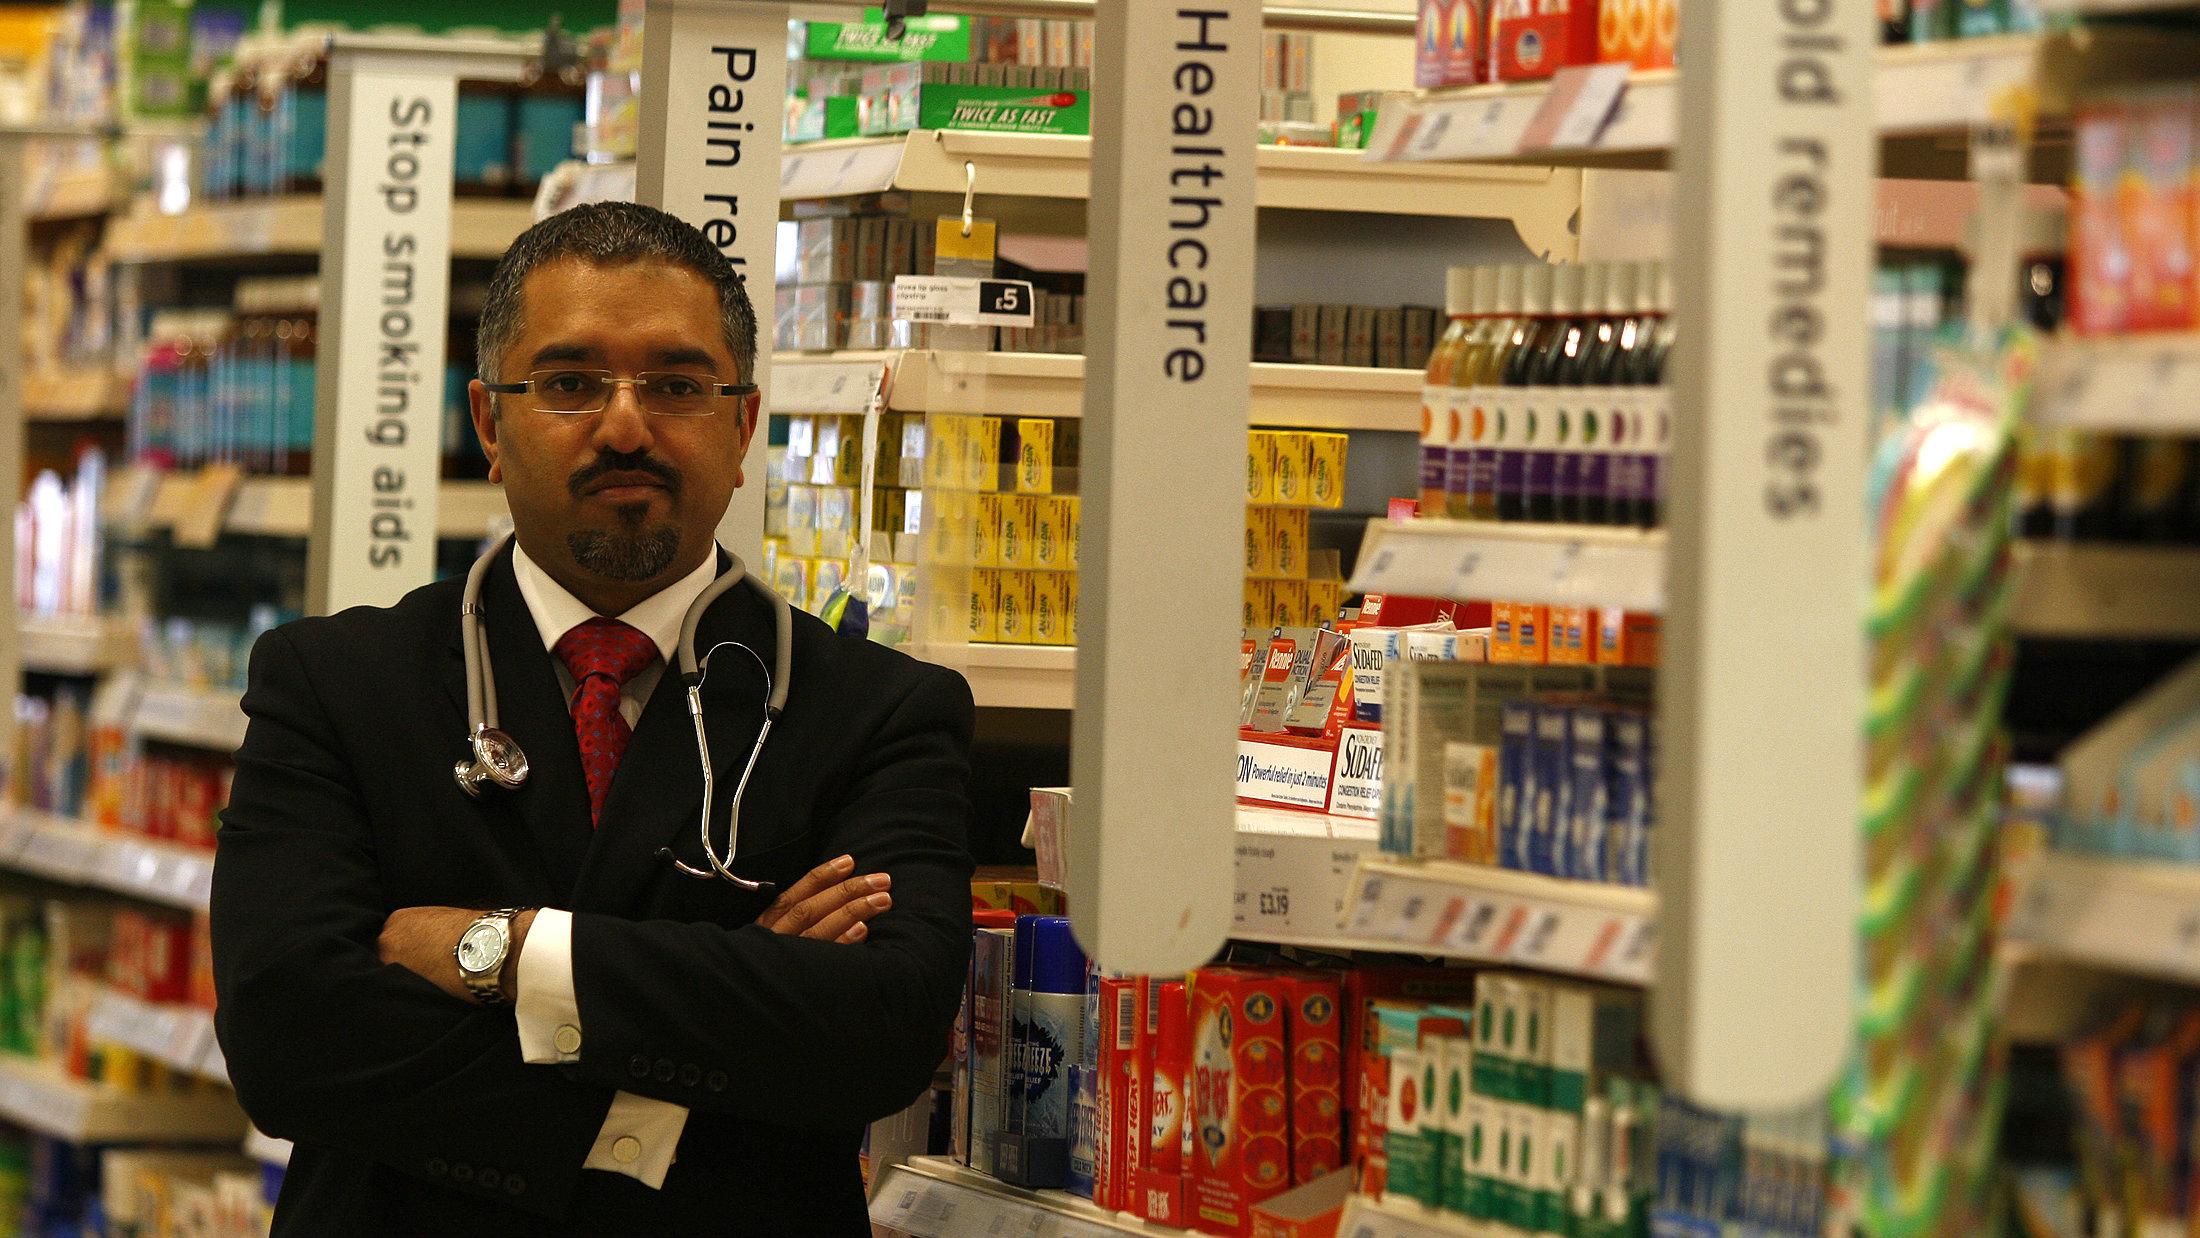 Doctor standing in pharmacy